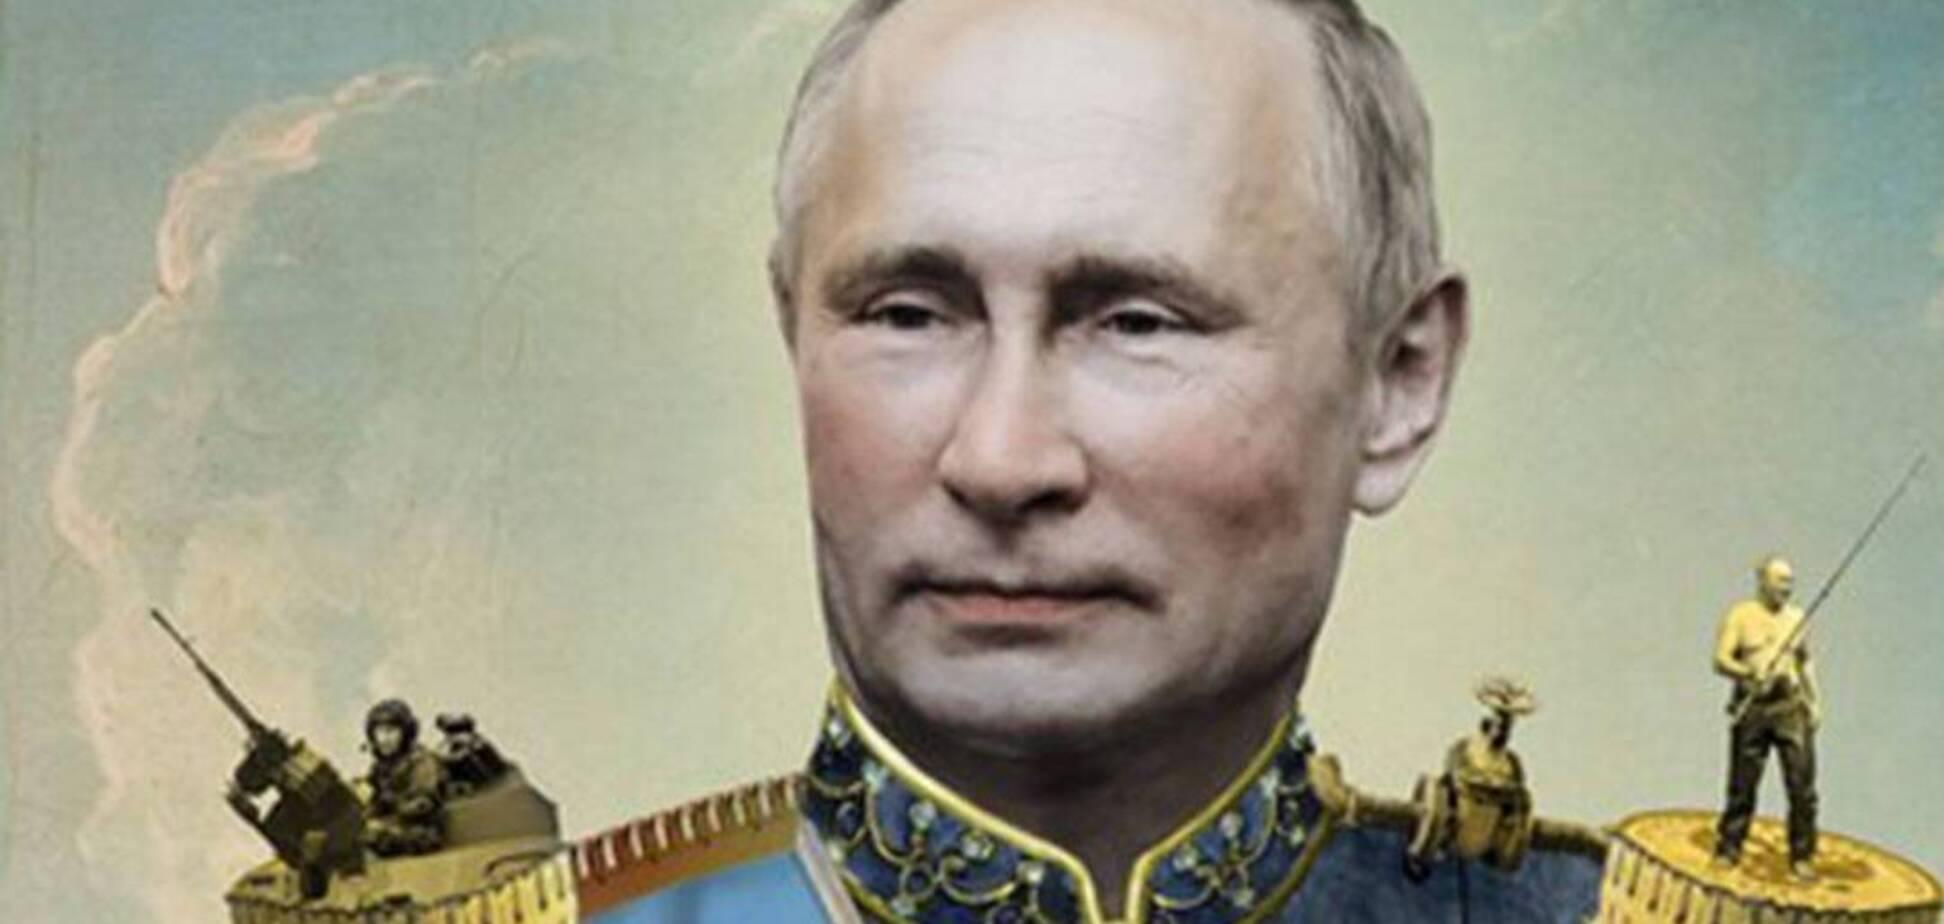 Протест в Хабаровске: конец сказке о добром царе